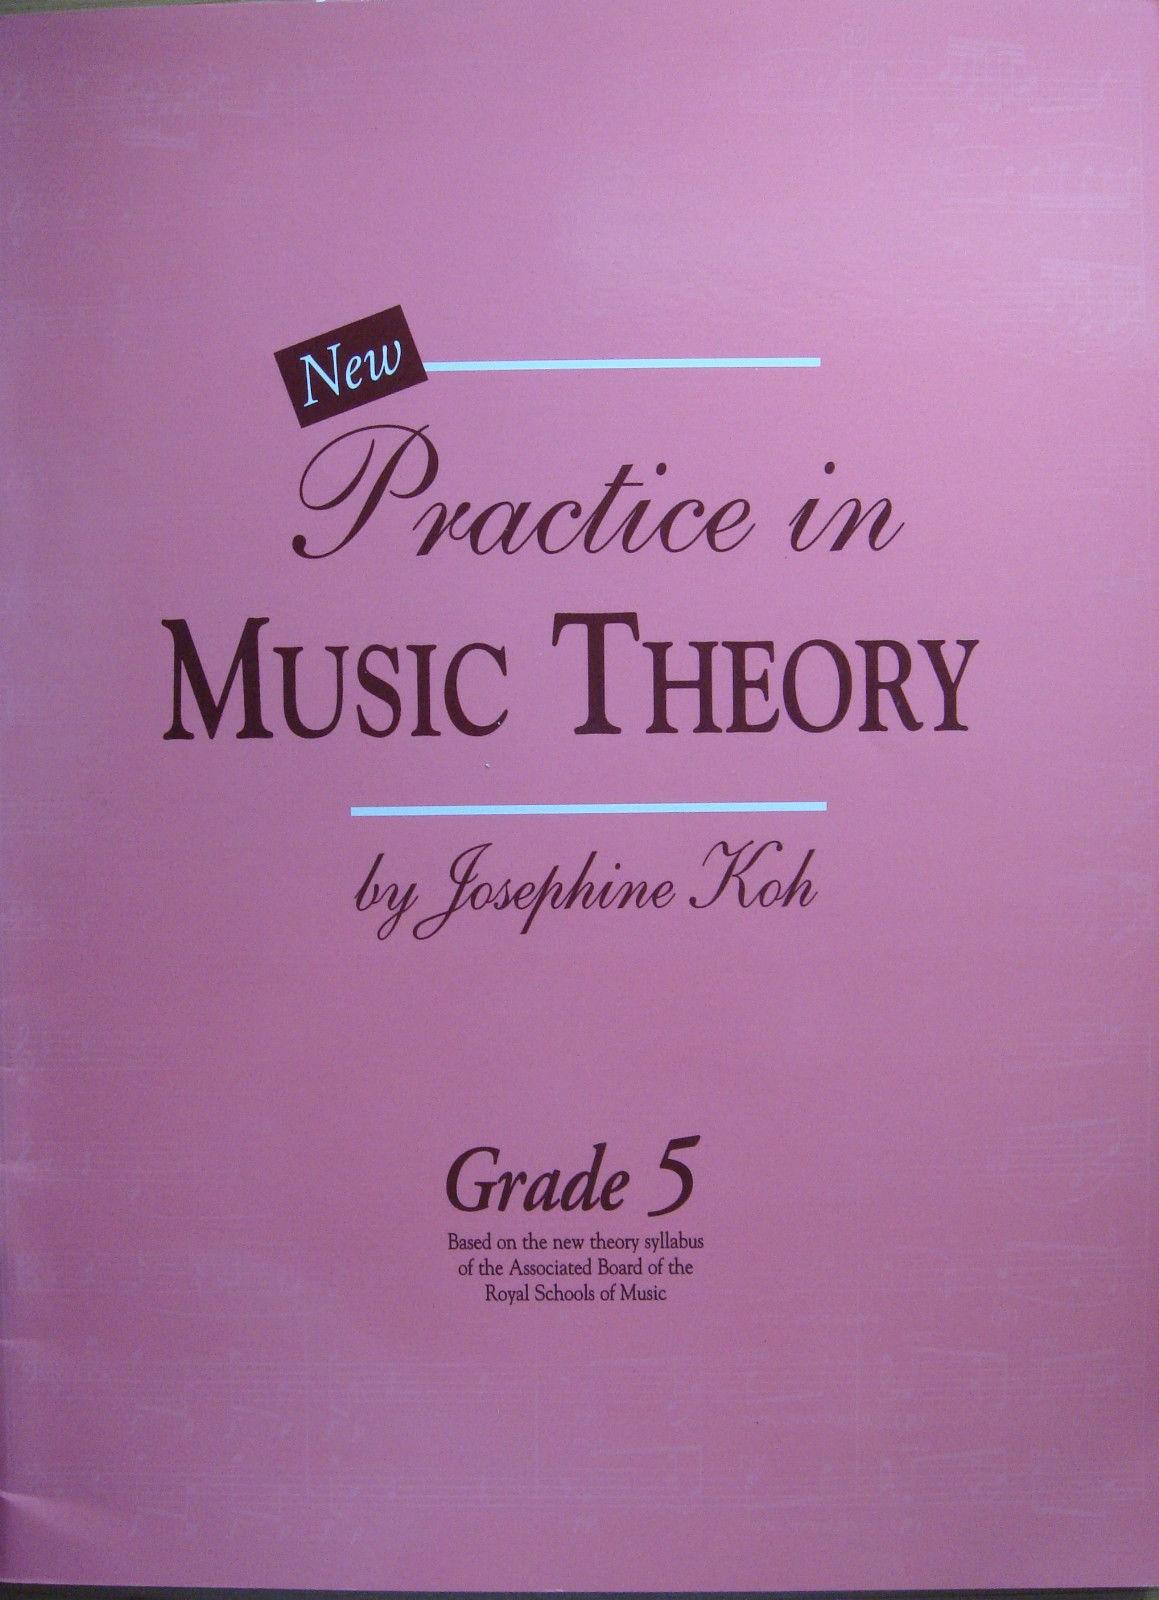 Practice In Music Theory Grade 5 Josephine Koh ABRSM Workbook 2006 Edition B82